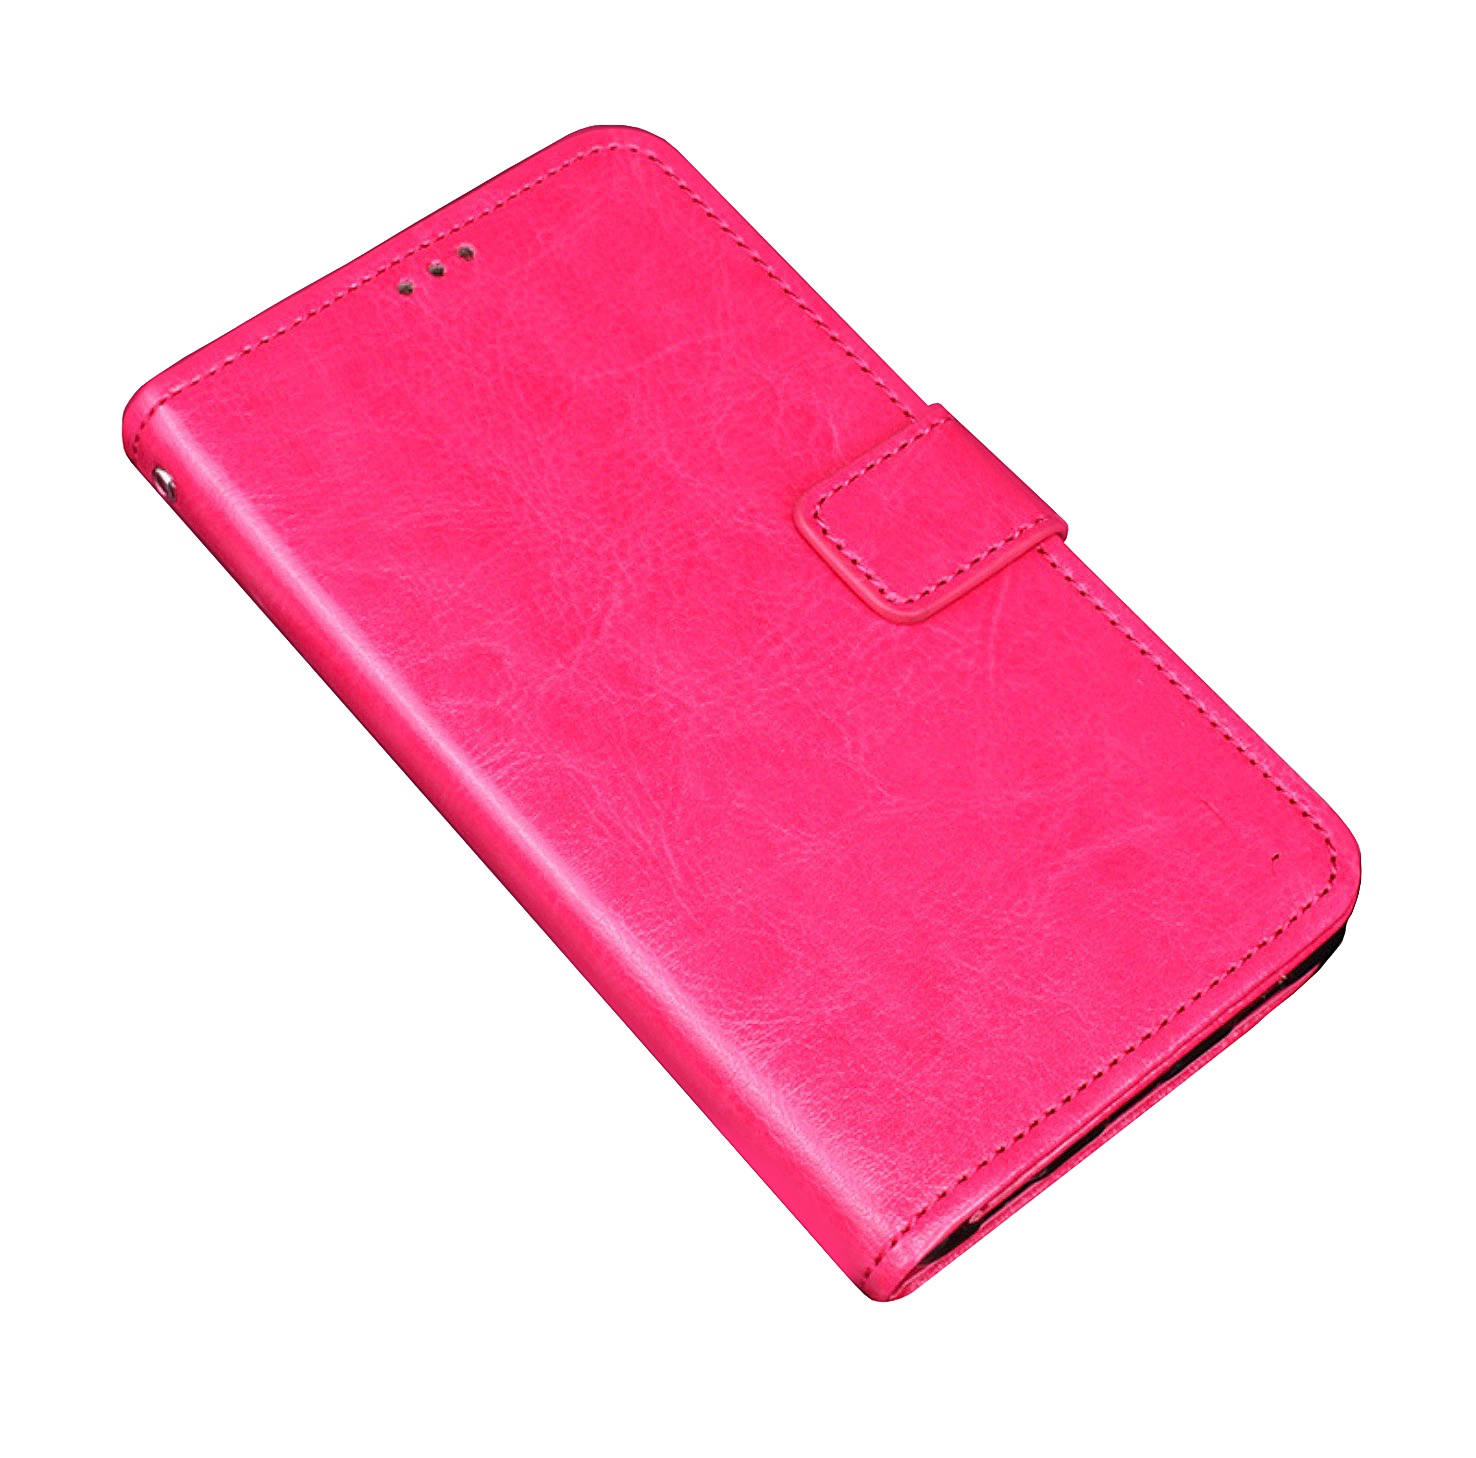 Чехол-книжка MyPads для Philips Xenium X818 / Philips X818 с мульти-подставкой застёжкой и визитницей розовый цена и фото